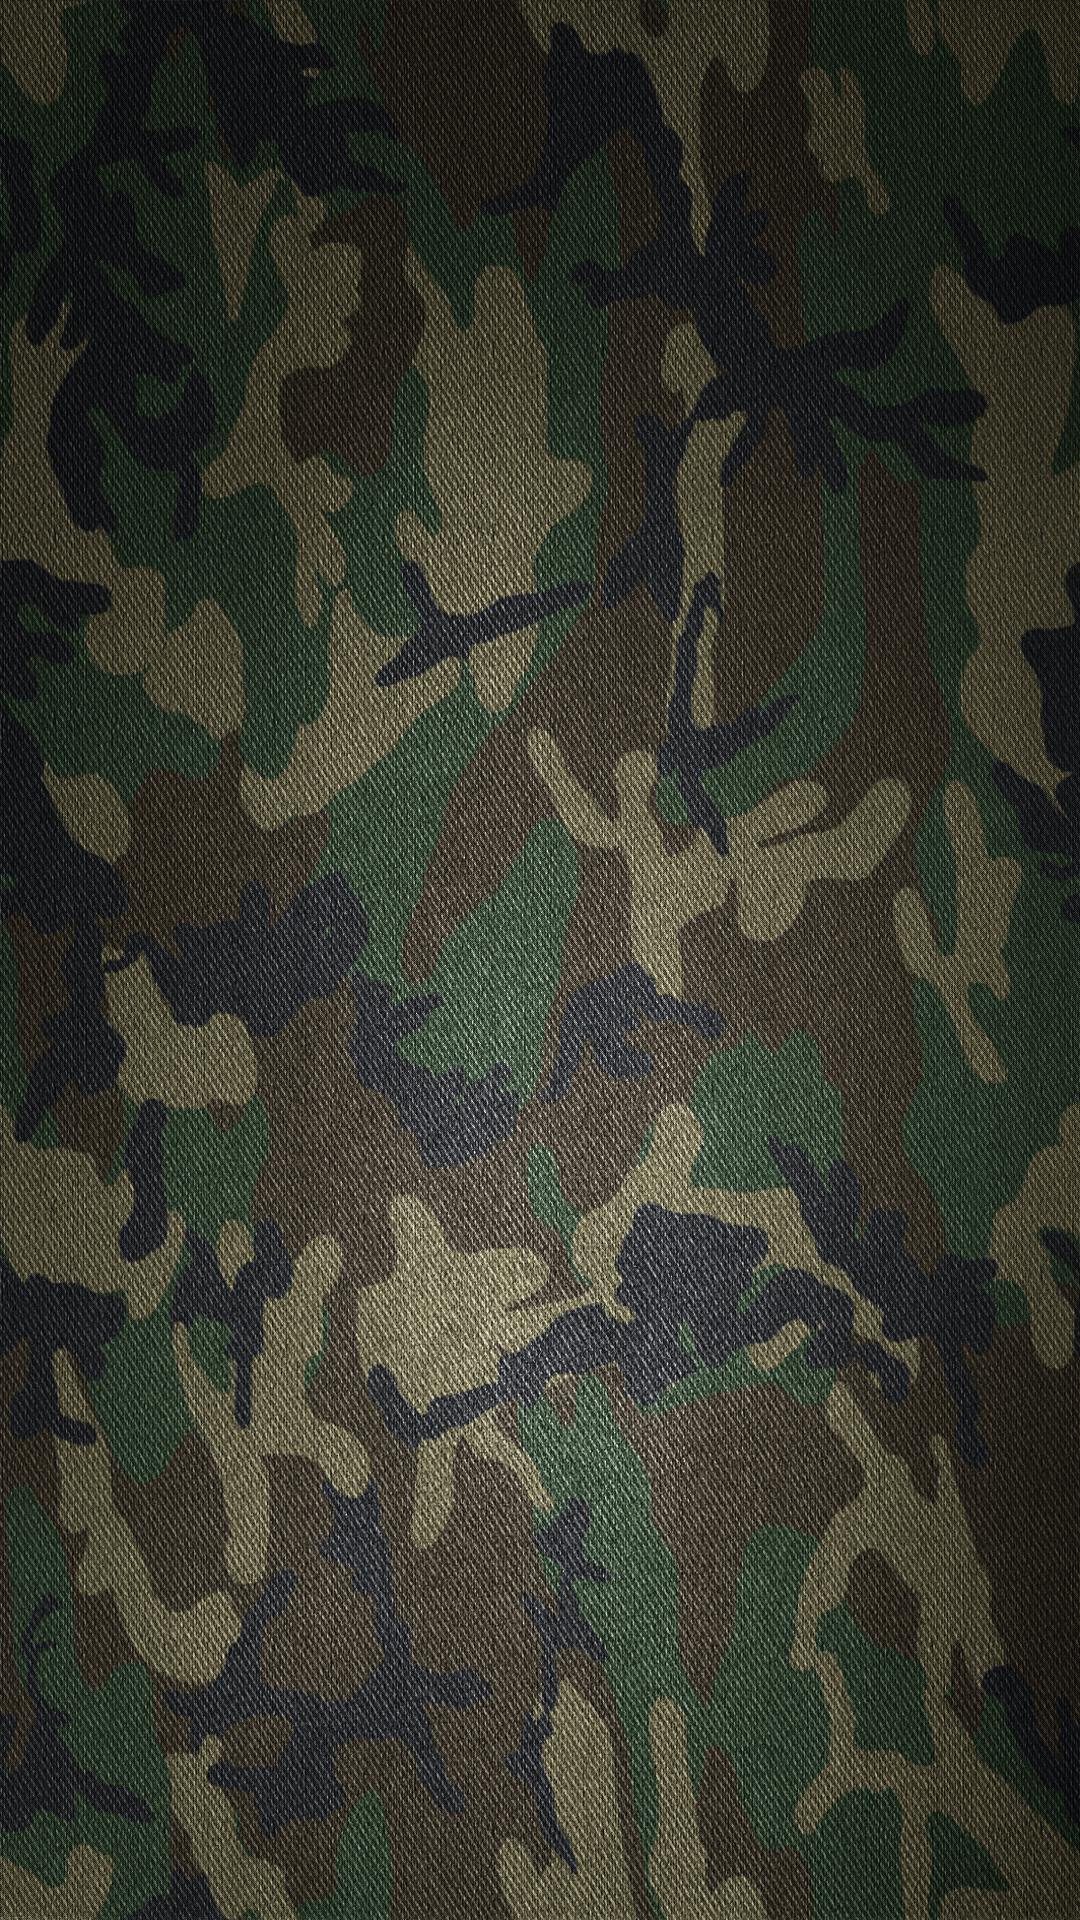 Camouflage pattern estampa camuflada pinterest for Cama wallpaper